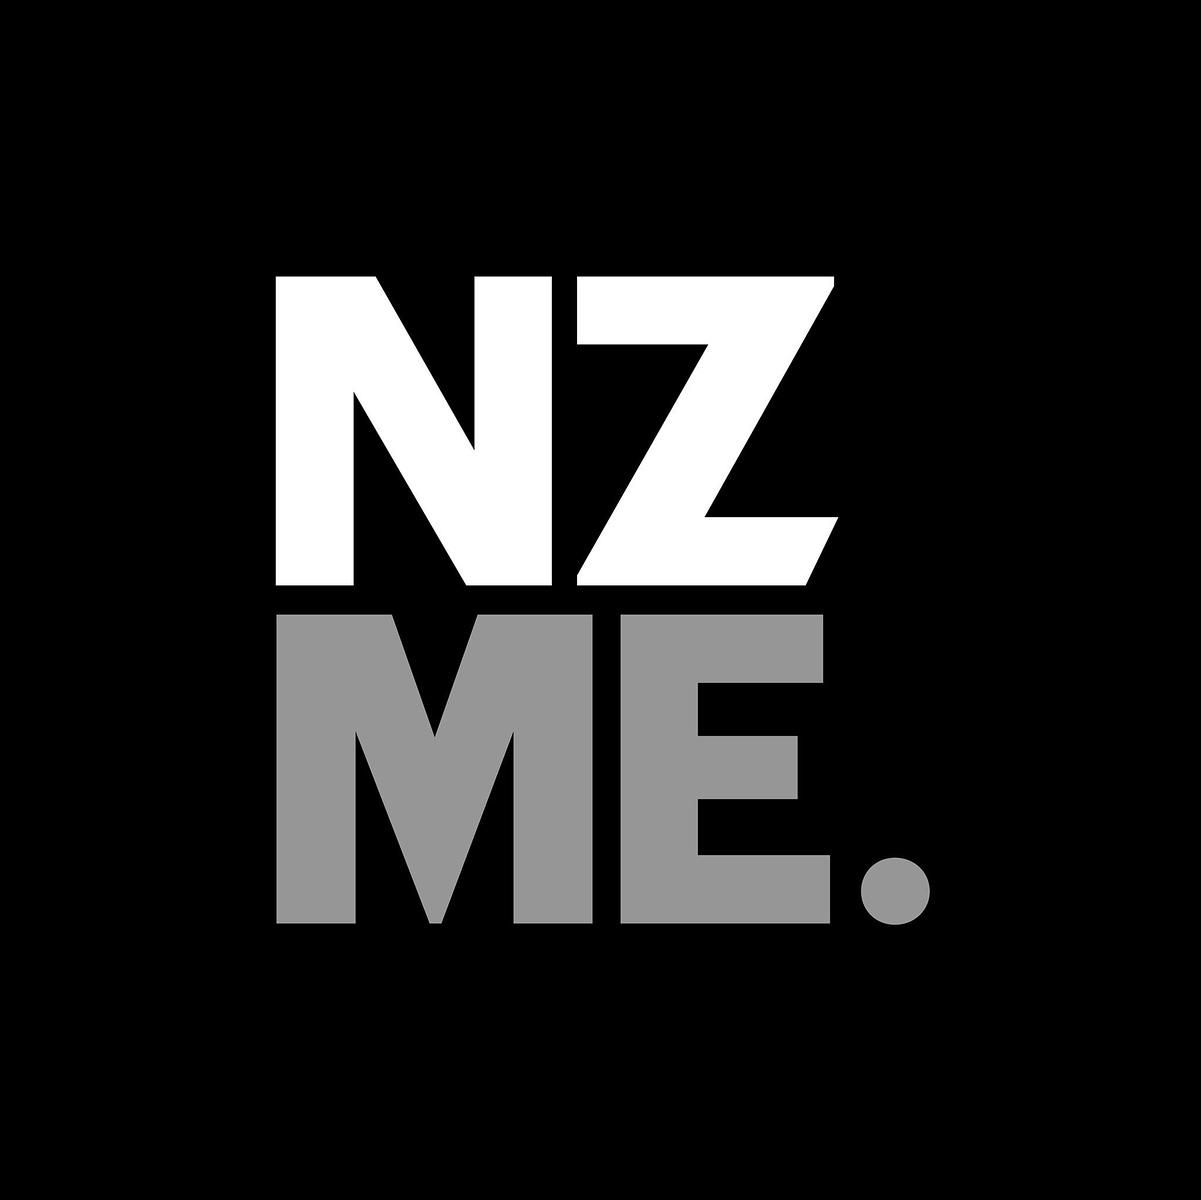 NZME logo (photo credit: Twitter)